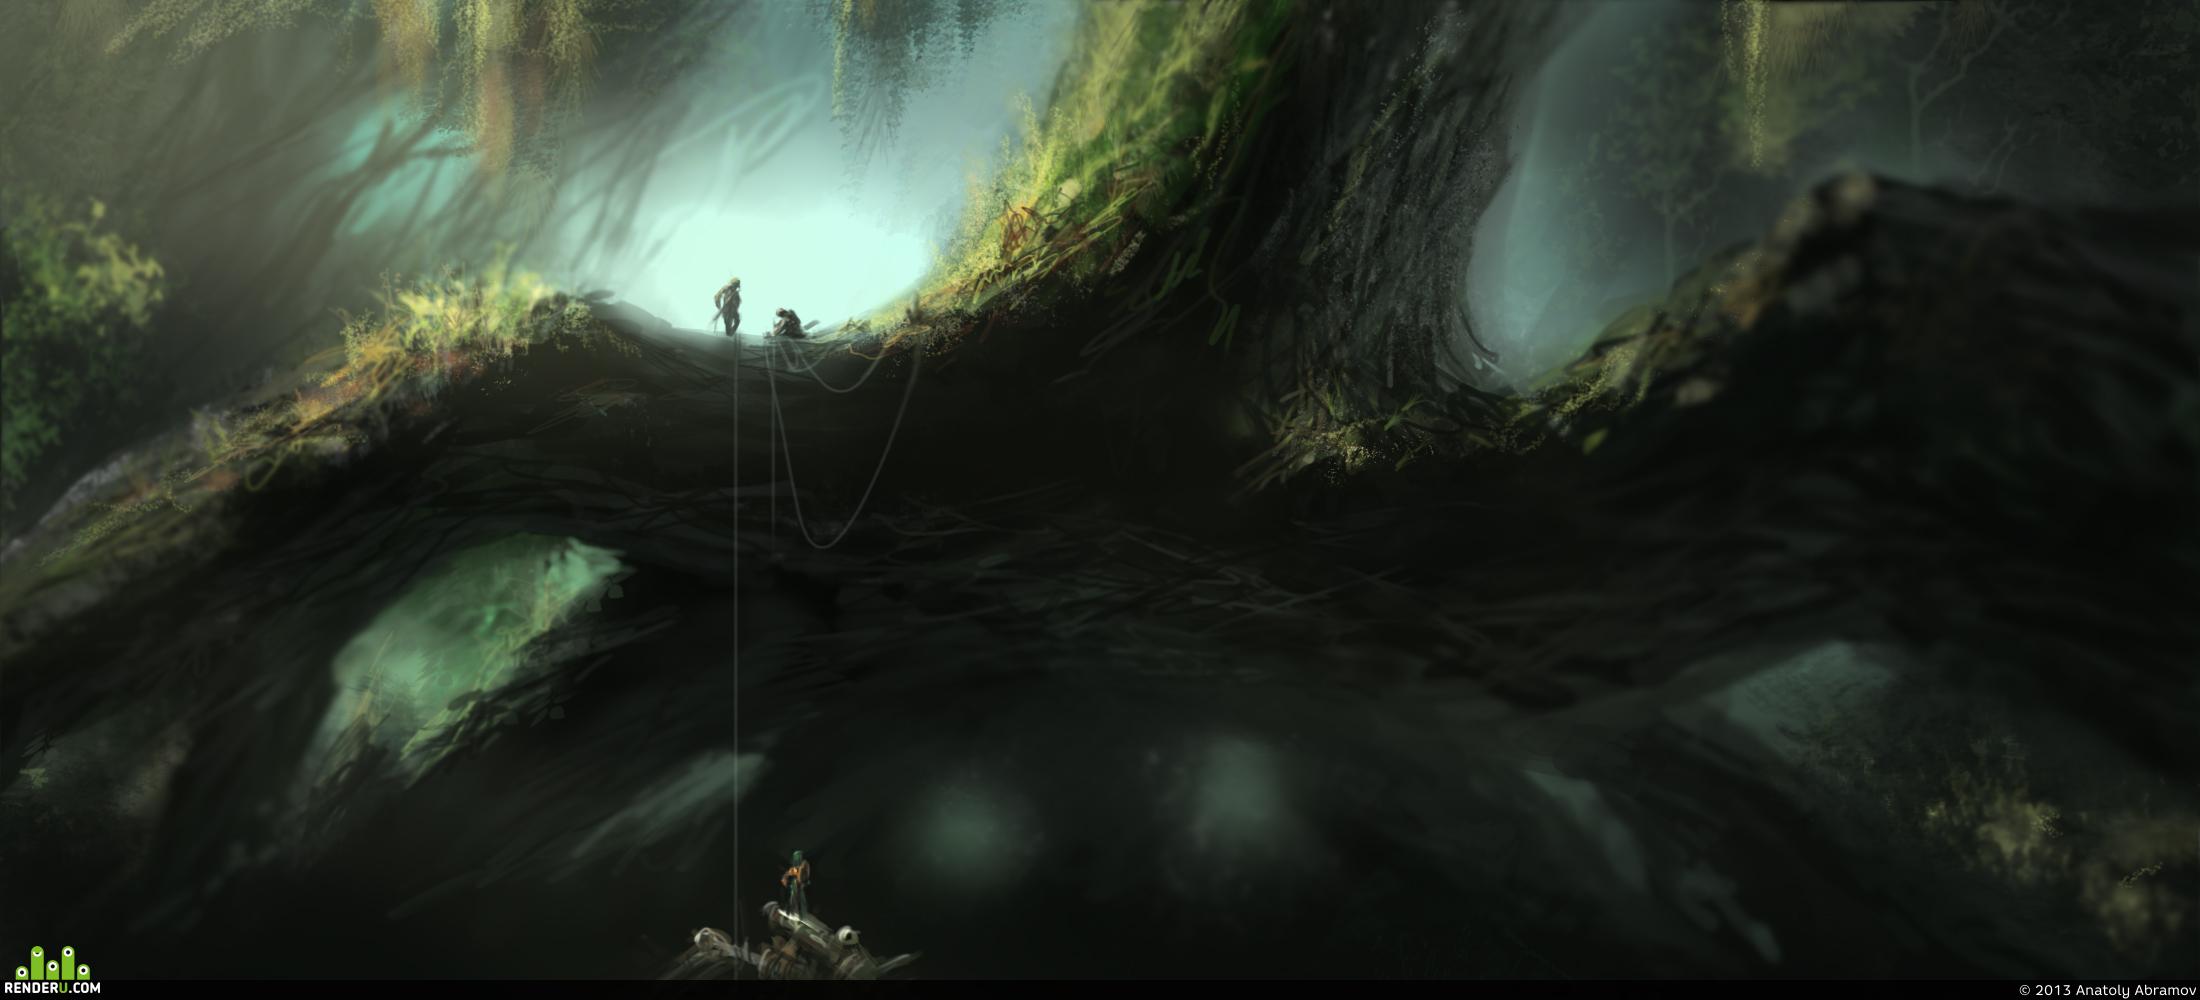 preview Под гигантскими корнями